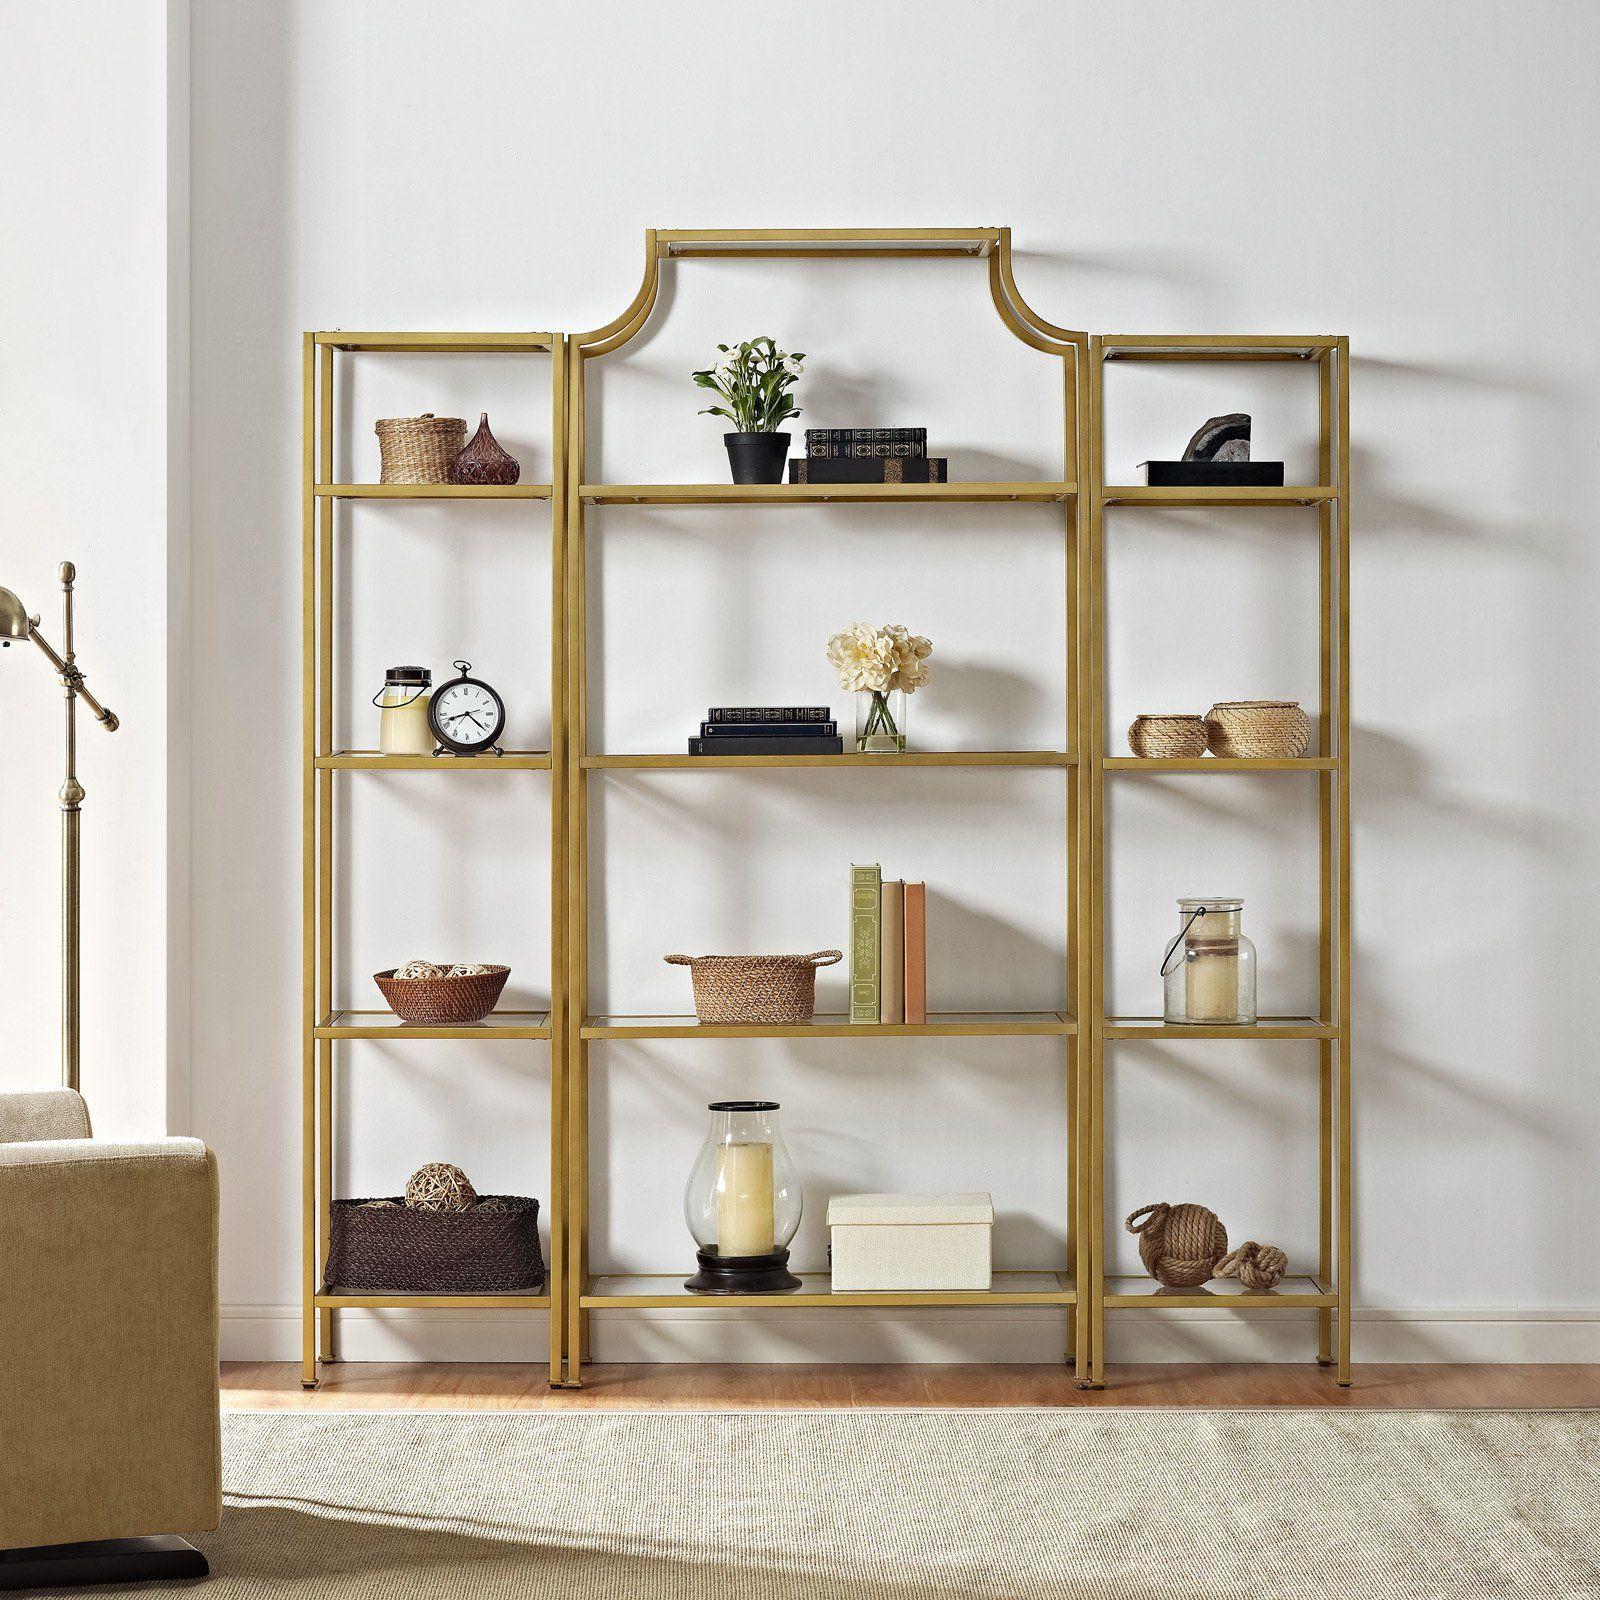 Home Etagere Bookcase Glass Shelves Bookcase